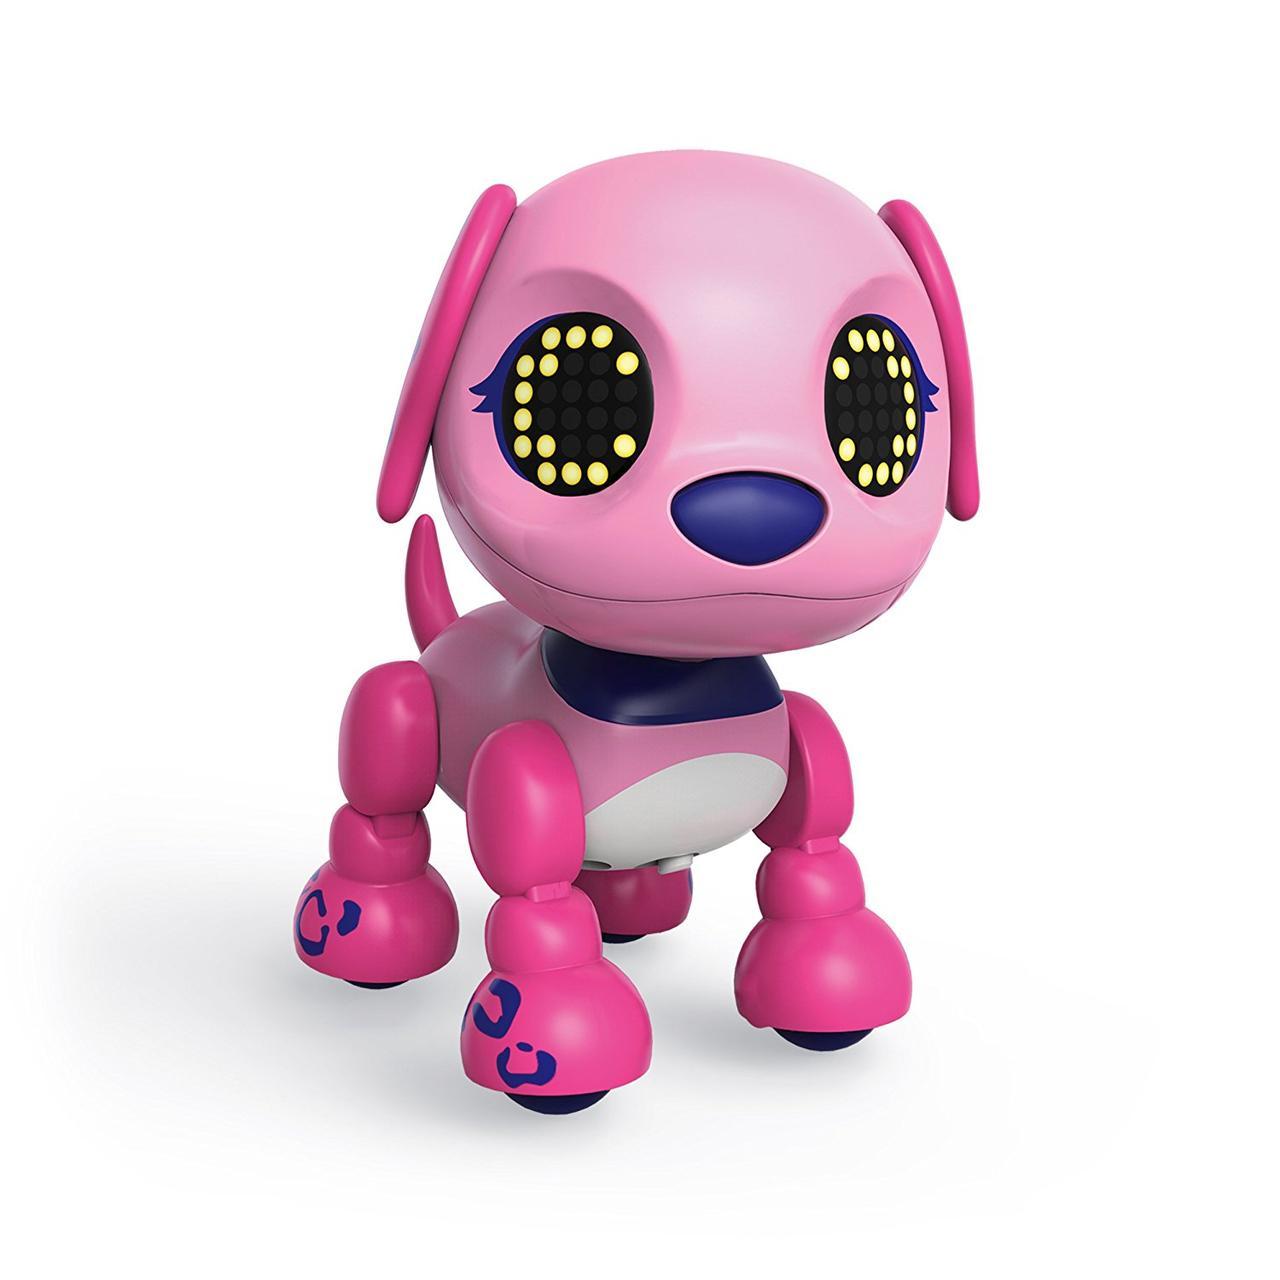 Zoomer Zupps Tiny Pups Beagle Flare Interactive Puppy Интерактивный щенок-робот Бигль Флэр